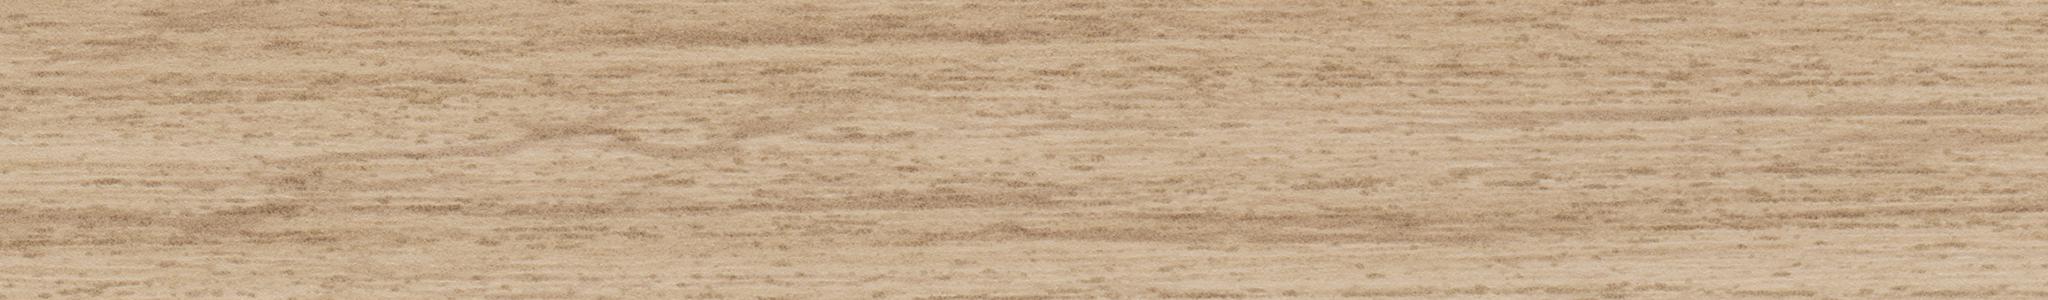 HD 284700 ABS Edge Walnut Pacific Pearl